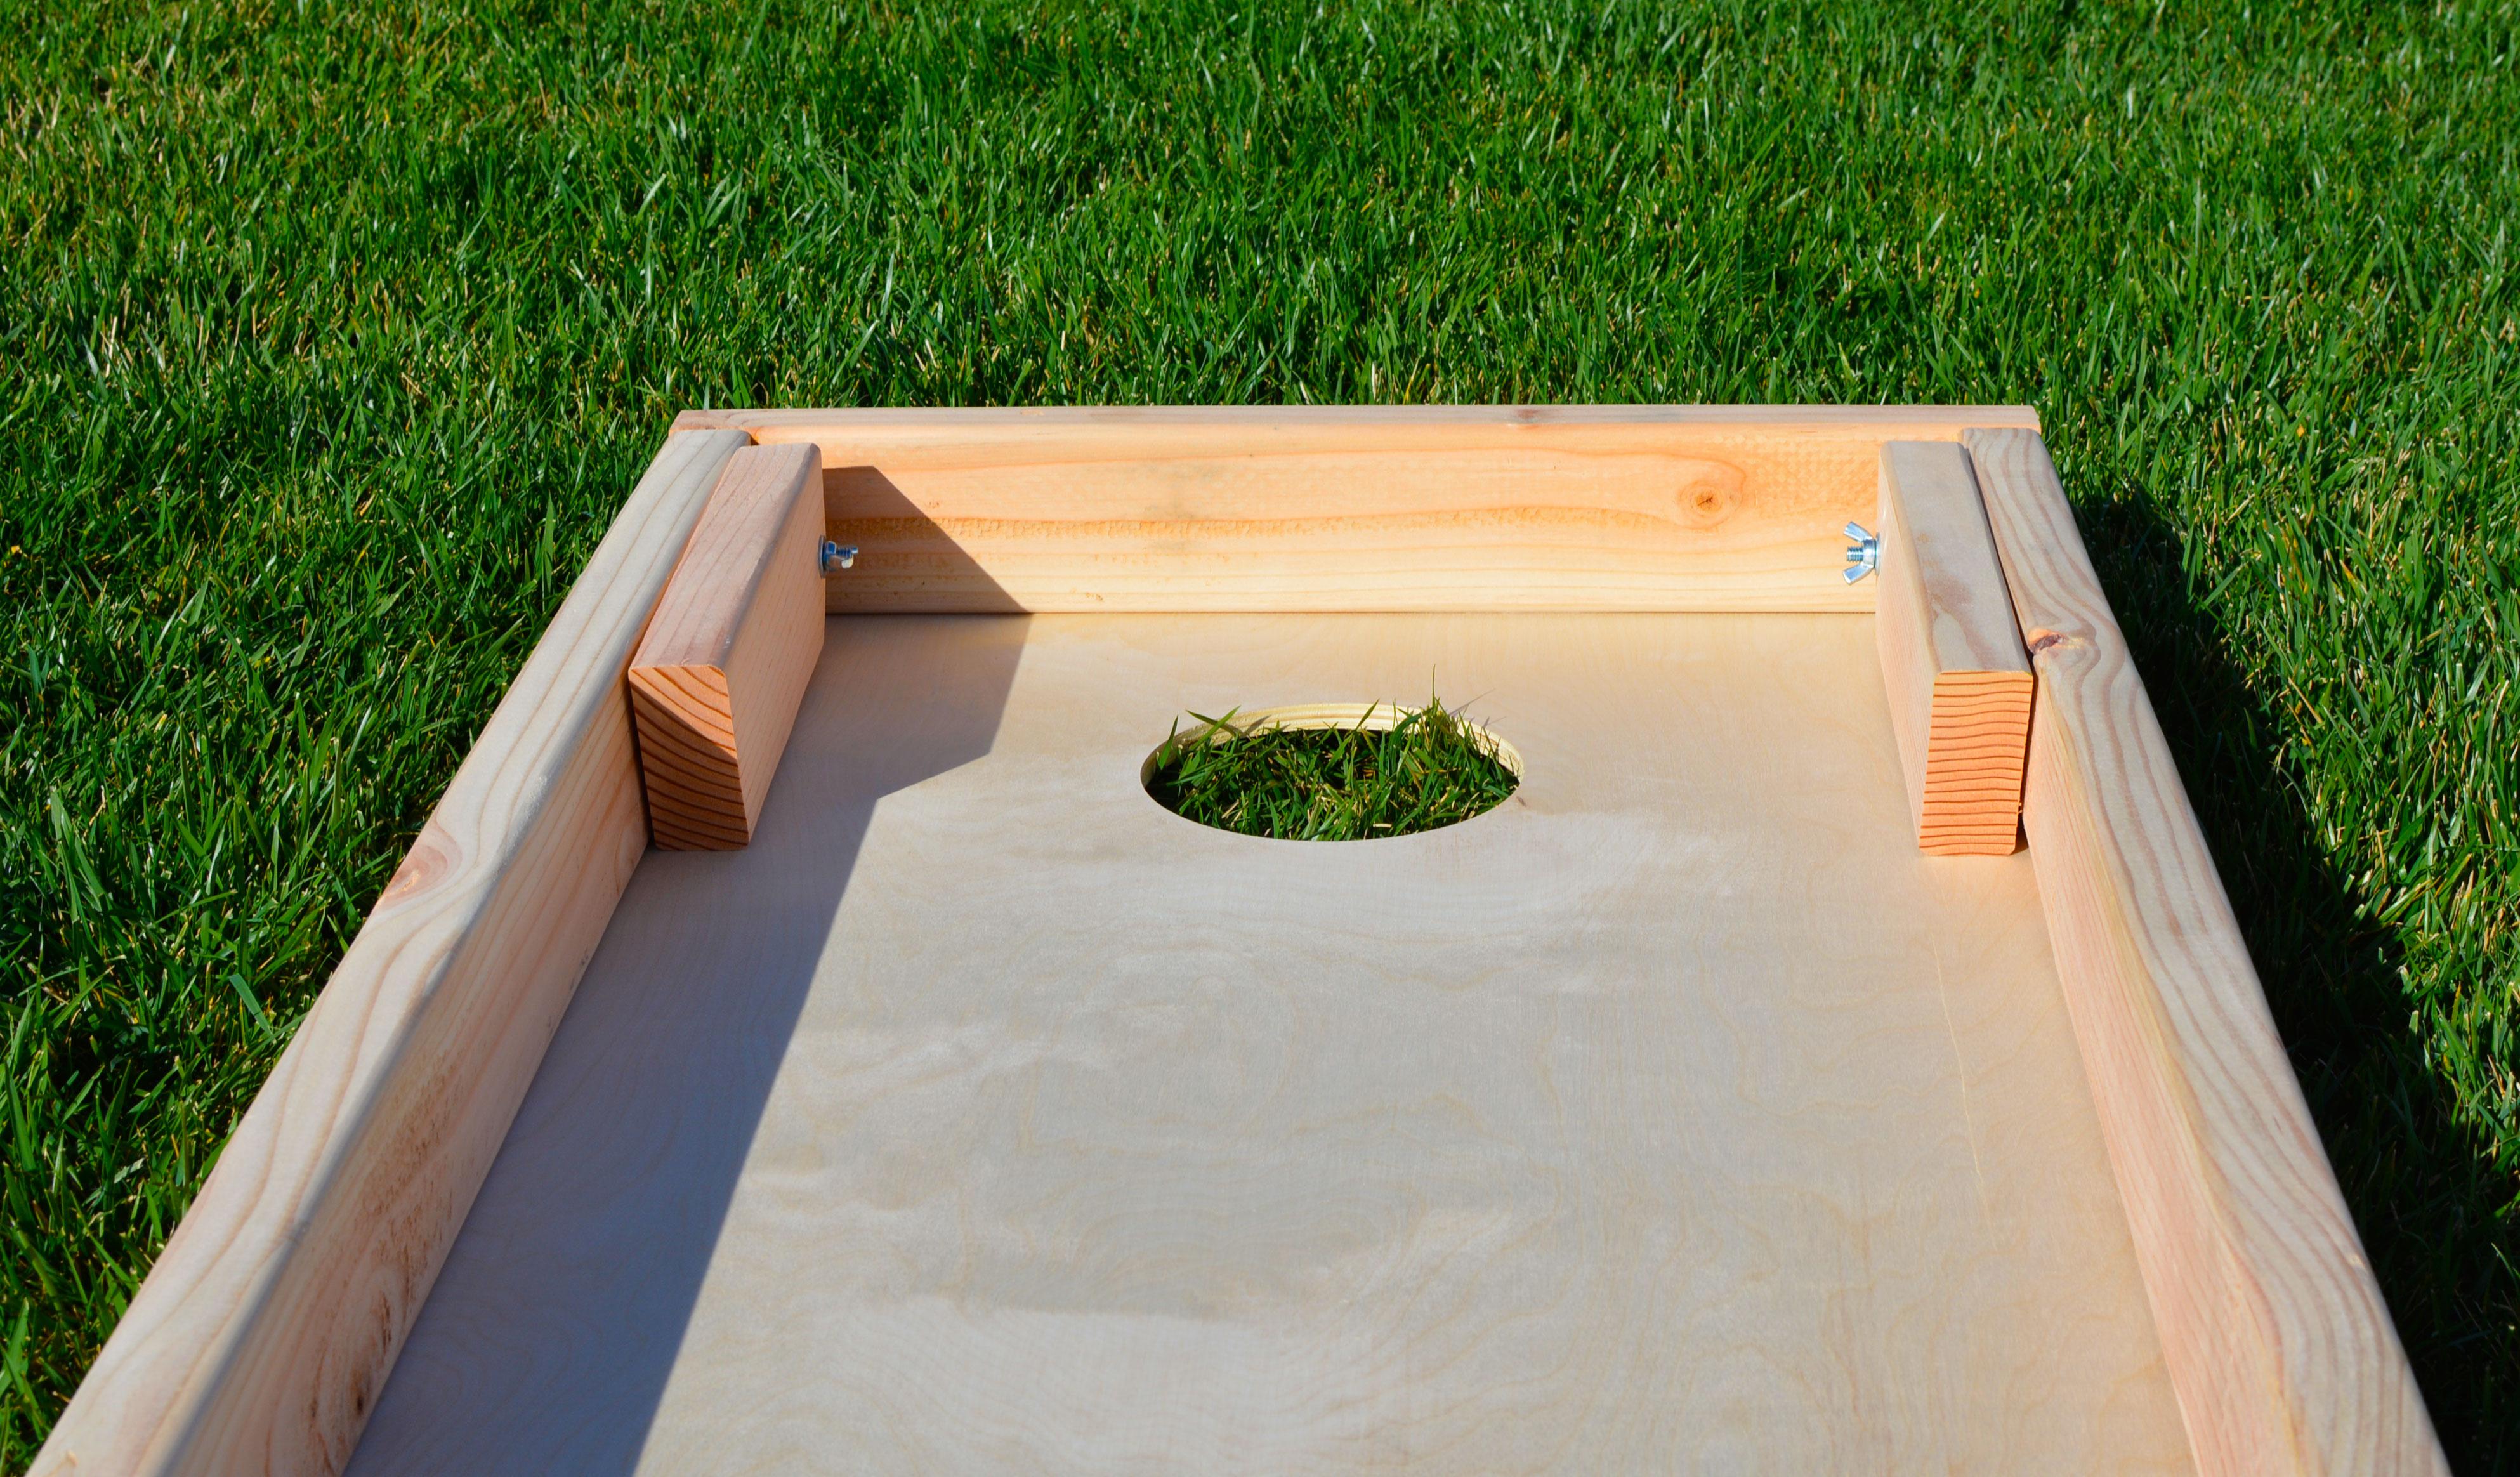 customcornhole1-cornhole-boards-legs-down.jpg